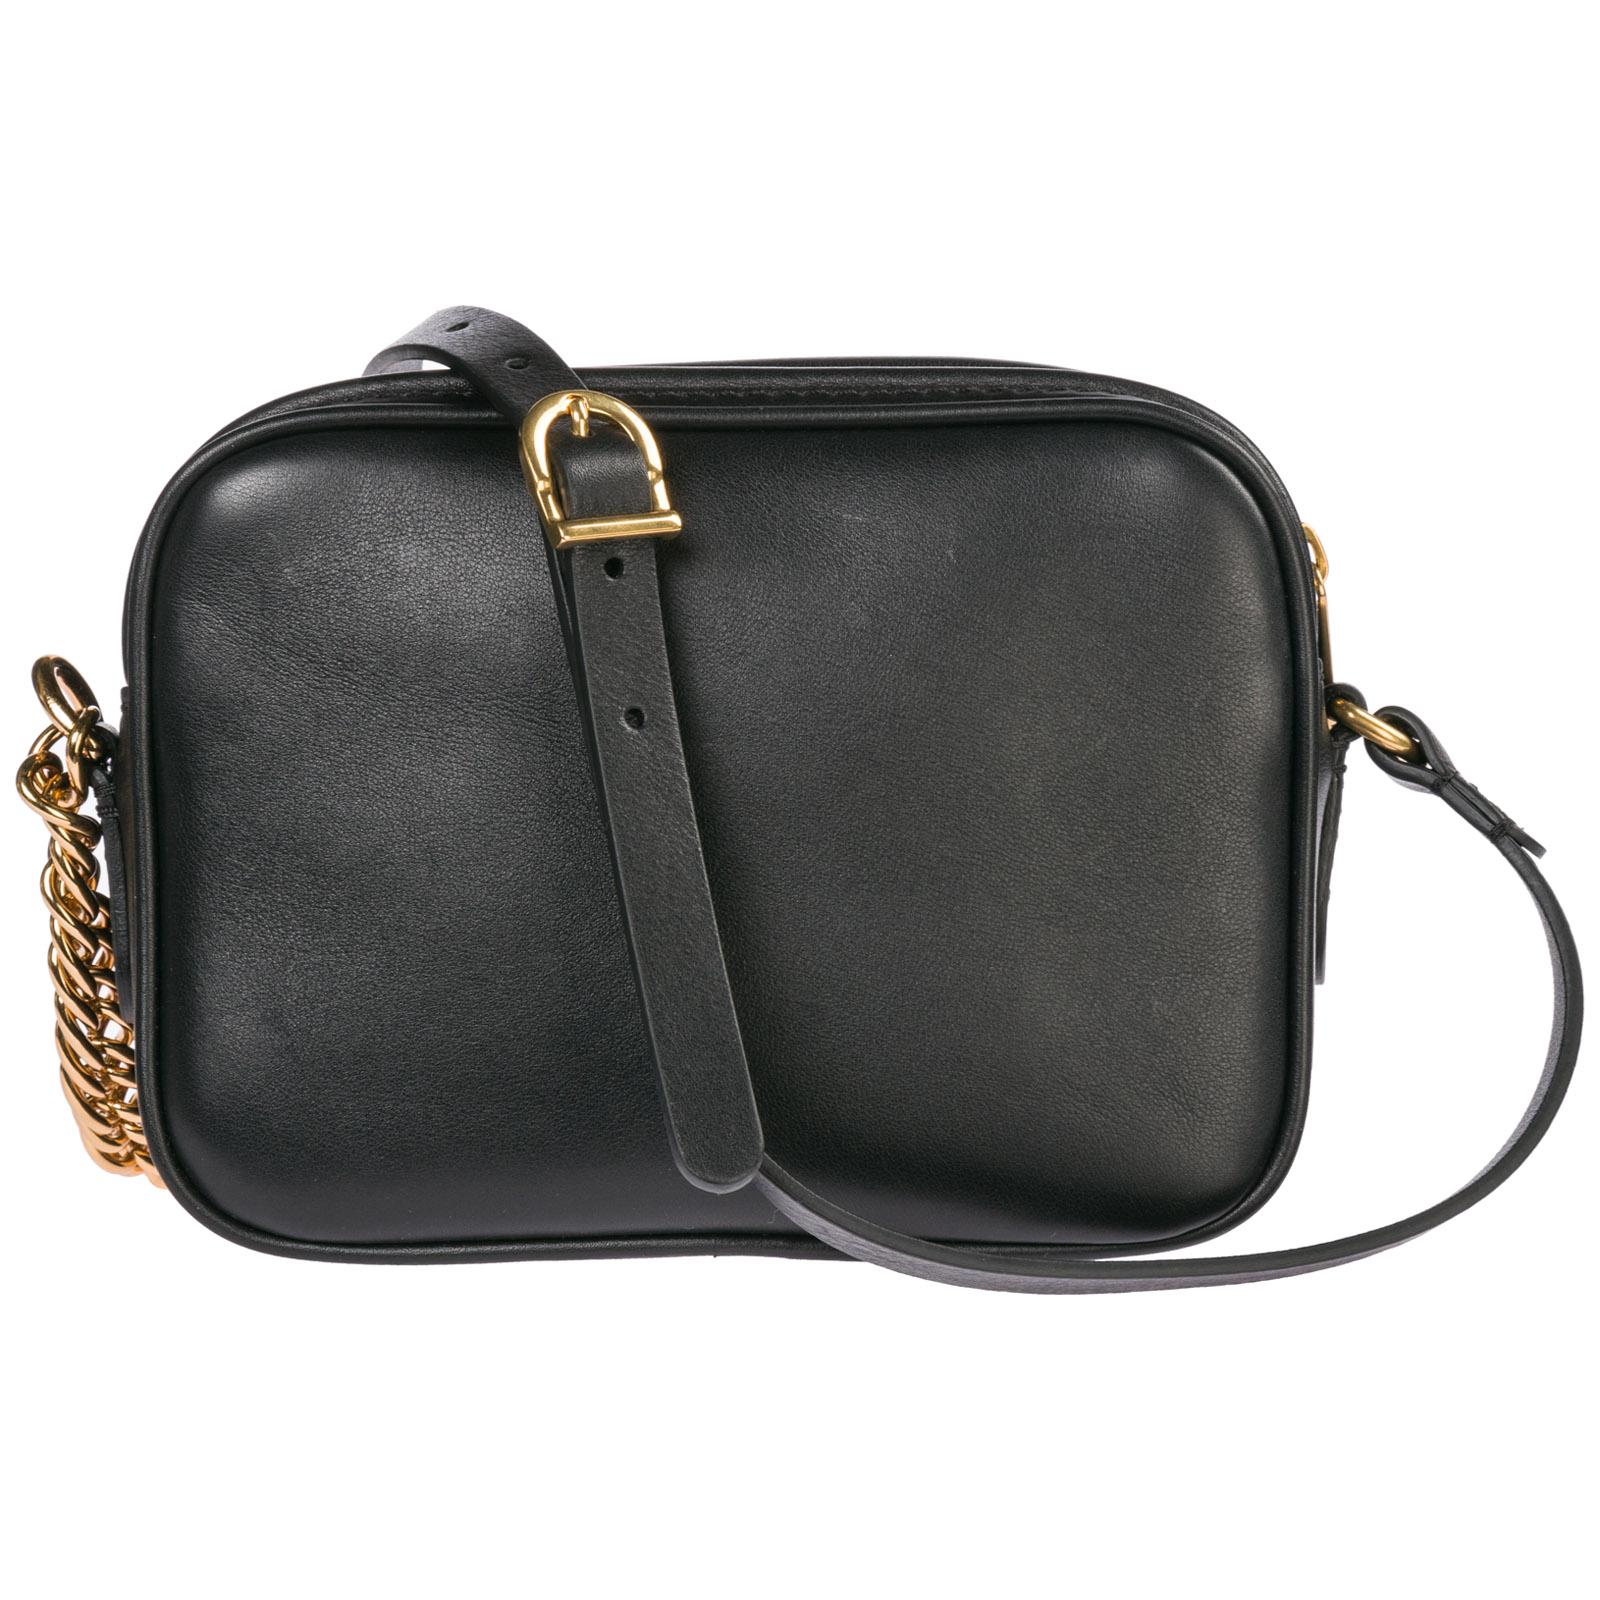 f93bfc7318 Women's leather cross-body messenger shoulder bag the link